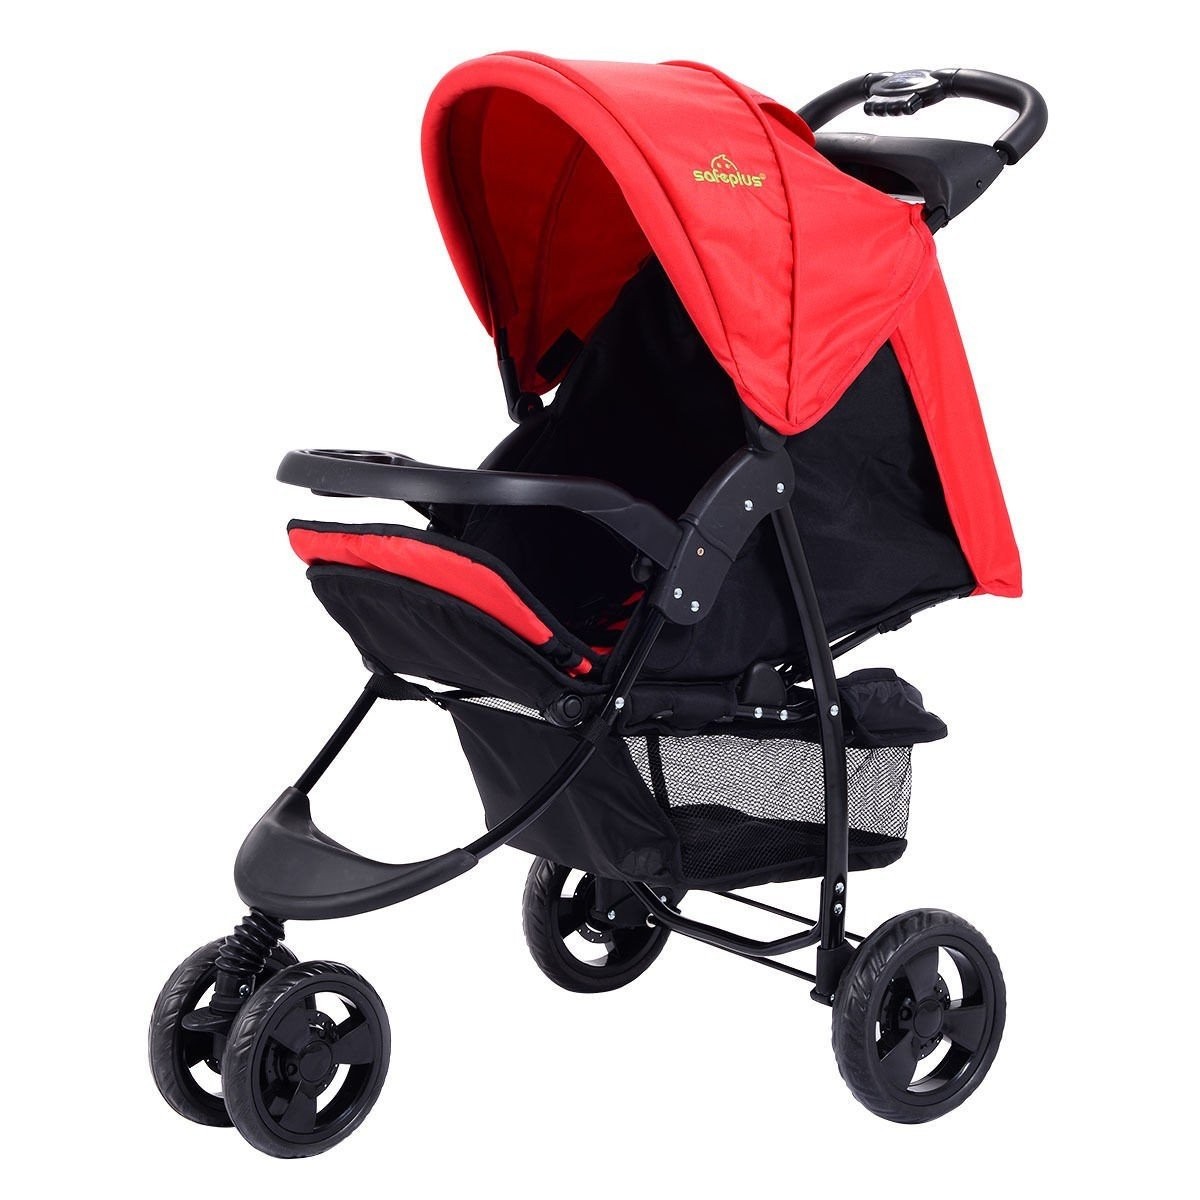 3 Wheel Foldable Baby Kids Travel Stroller Pushchair Buggy Newborn Infant - Red